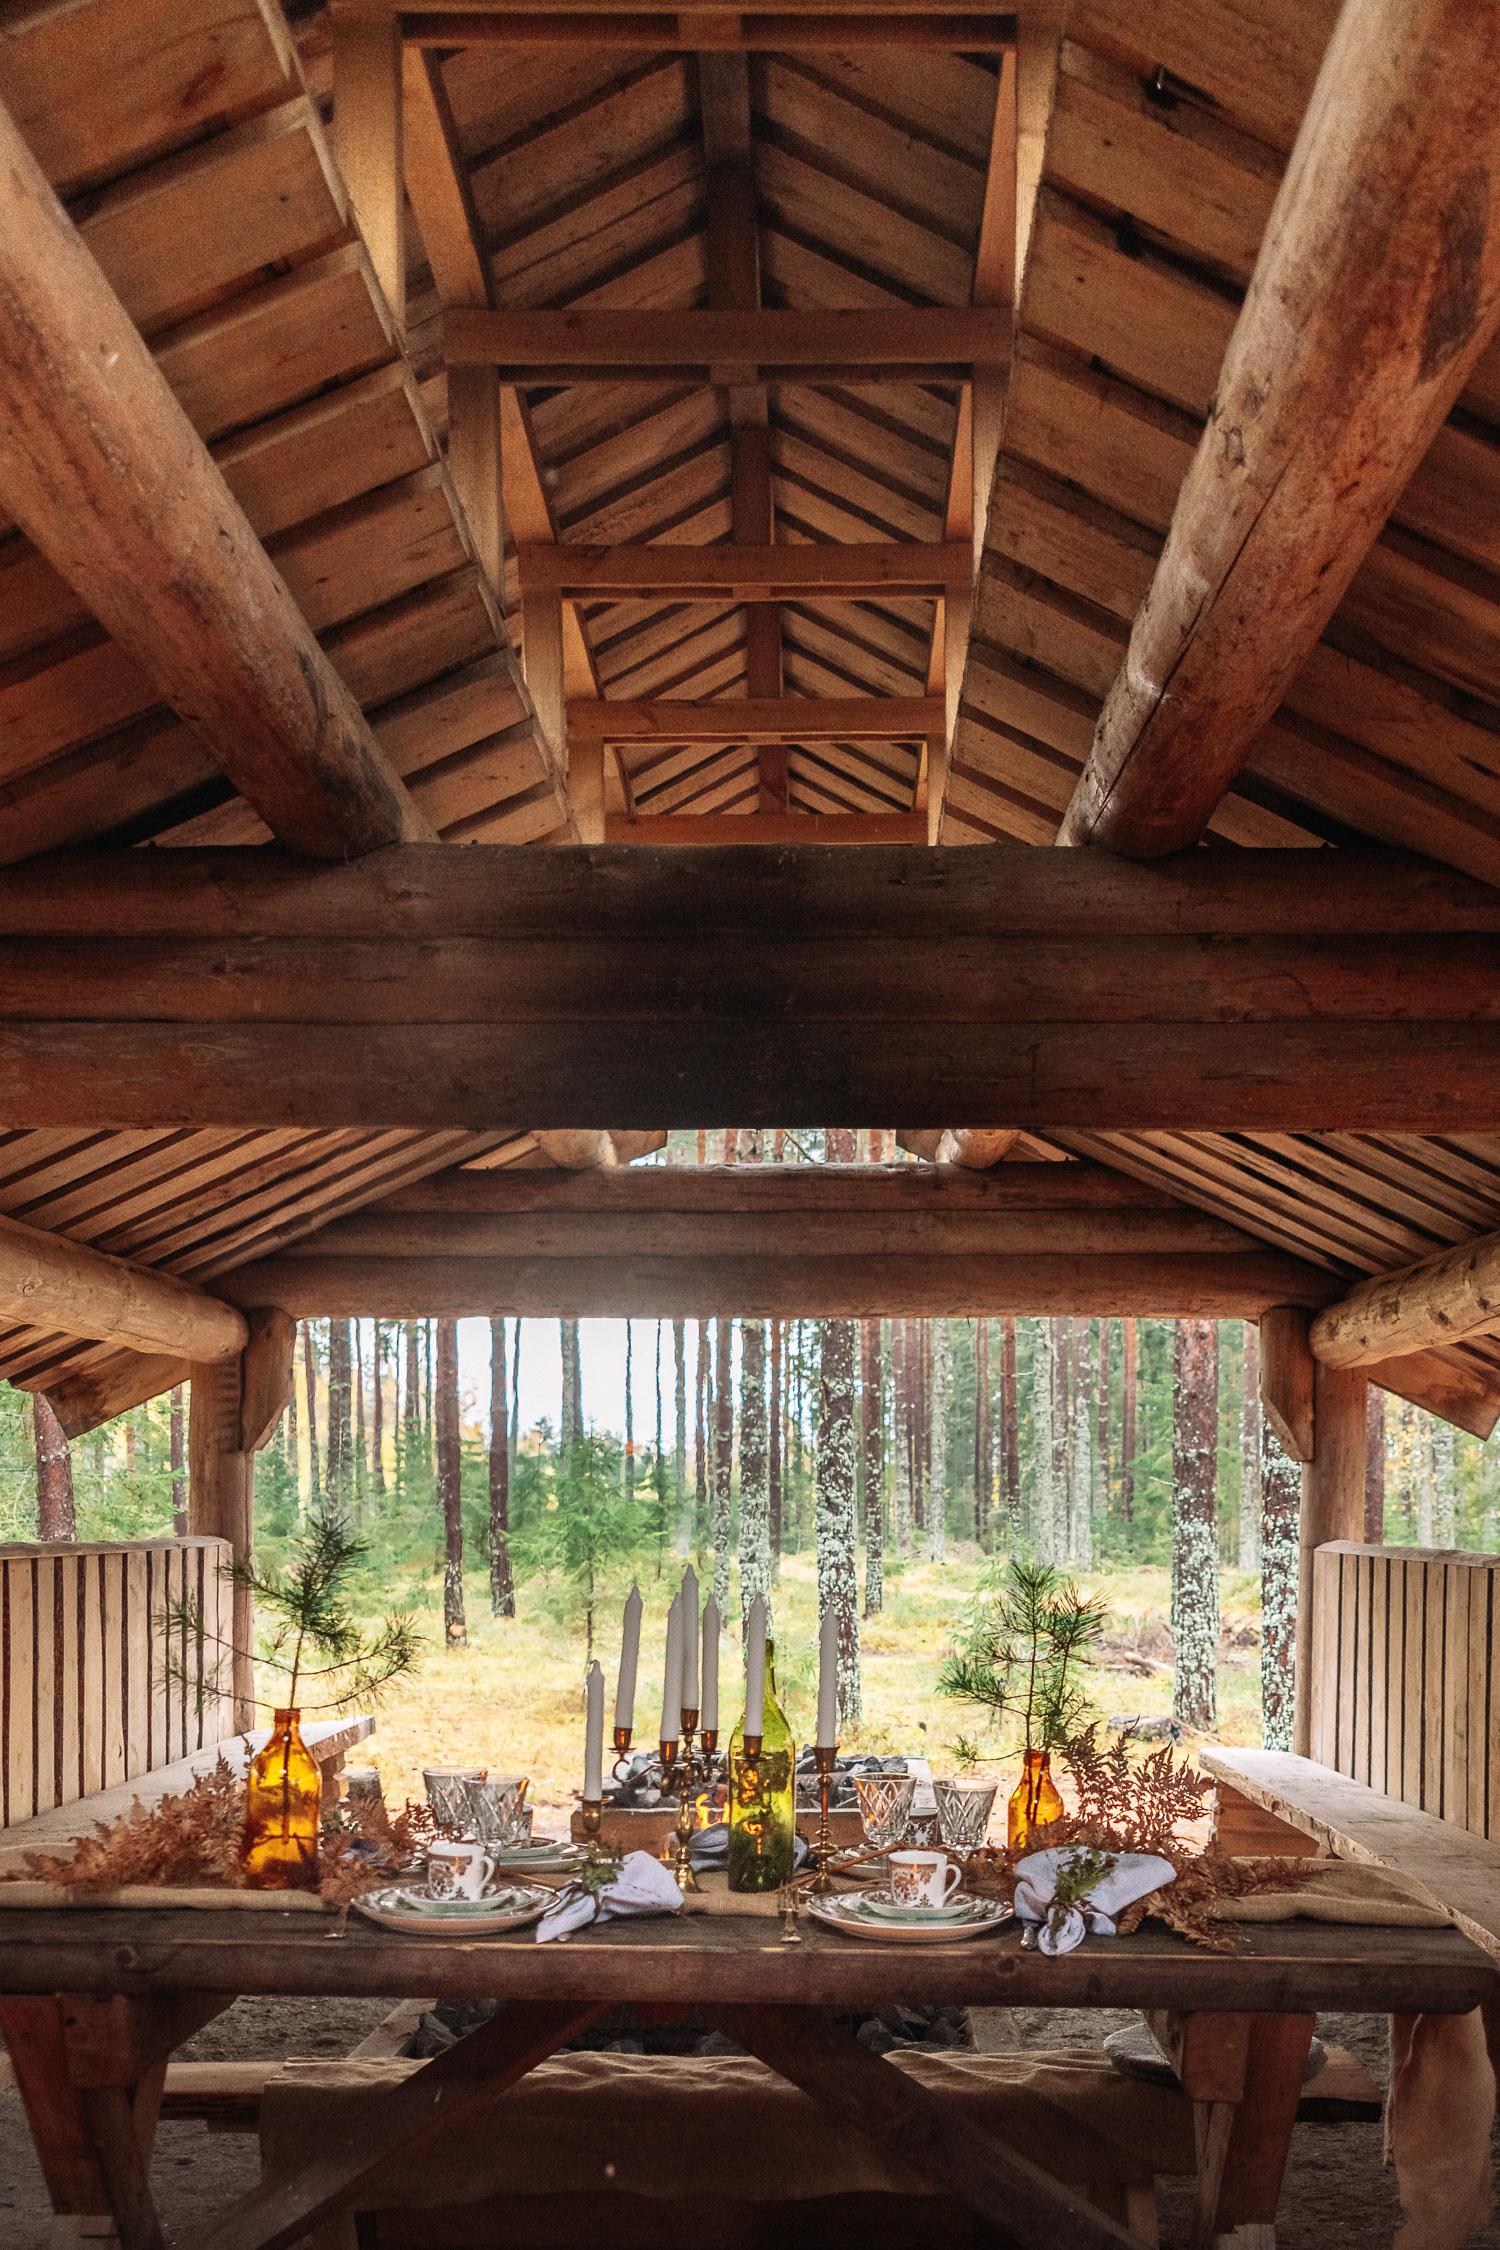 In Da Woods-matupplevelse med Ströms Catering, Örebro